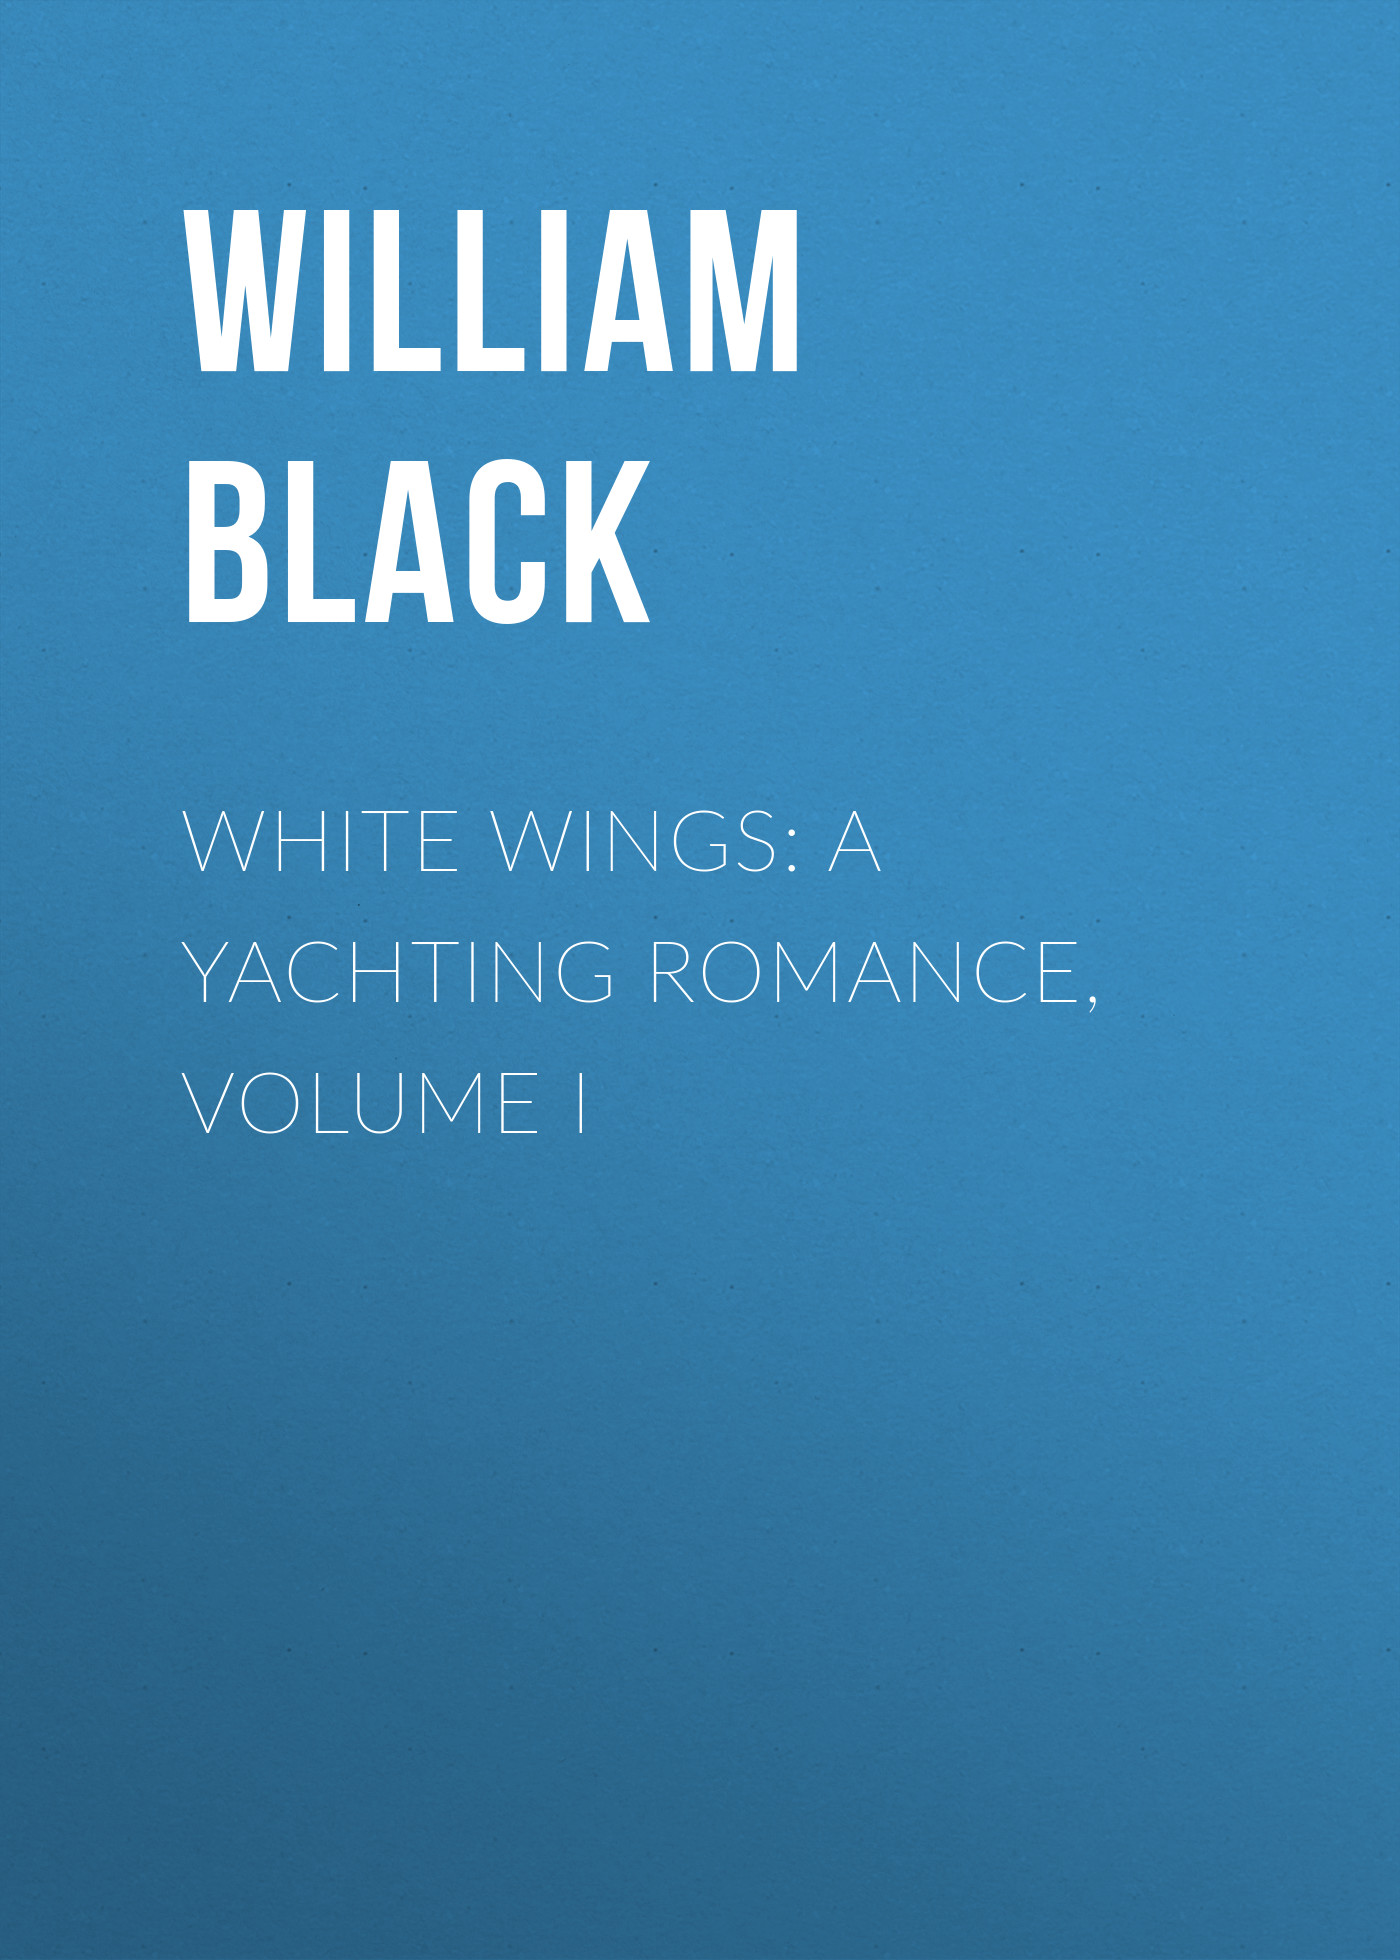 лучшая цена Black William White Wings: A Yachting Romance, Volume I